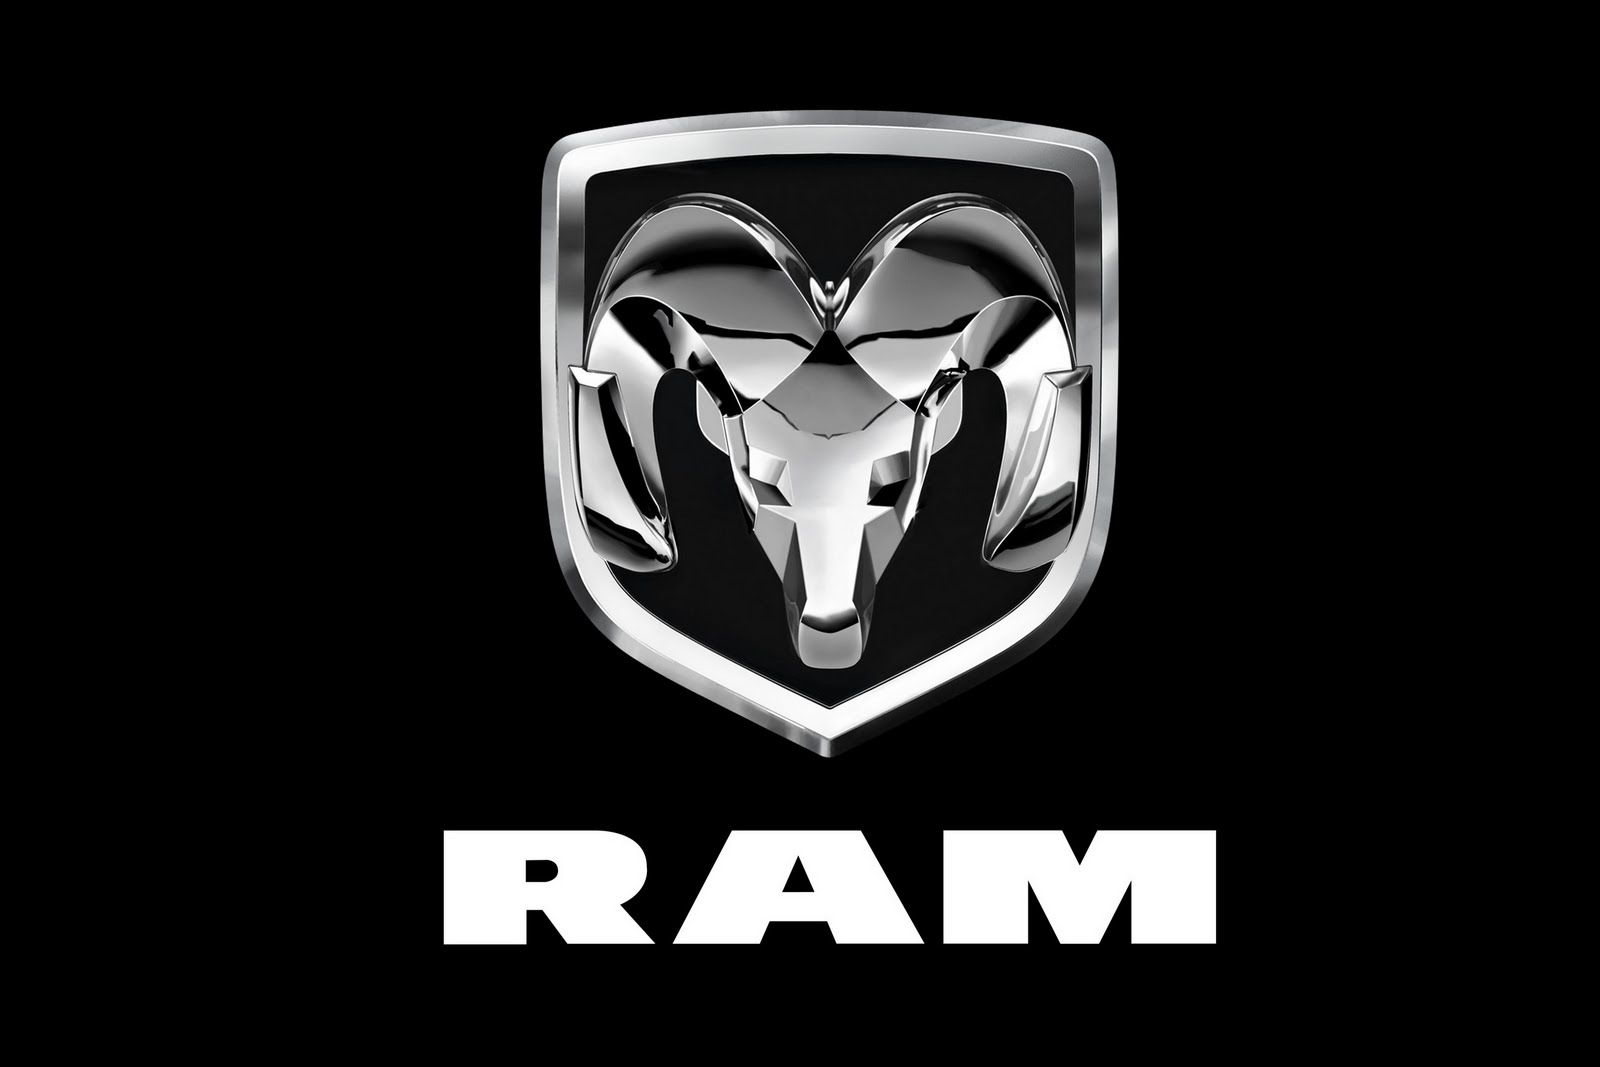 dodge ram logo wallpaper hd wallpaper background - Dodge Ram Logo